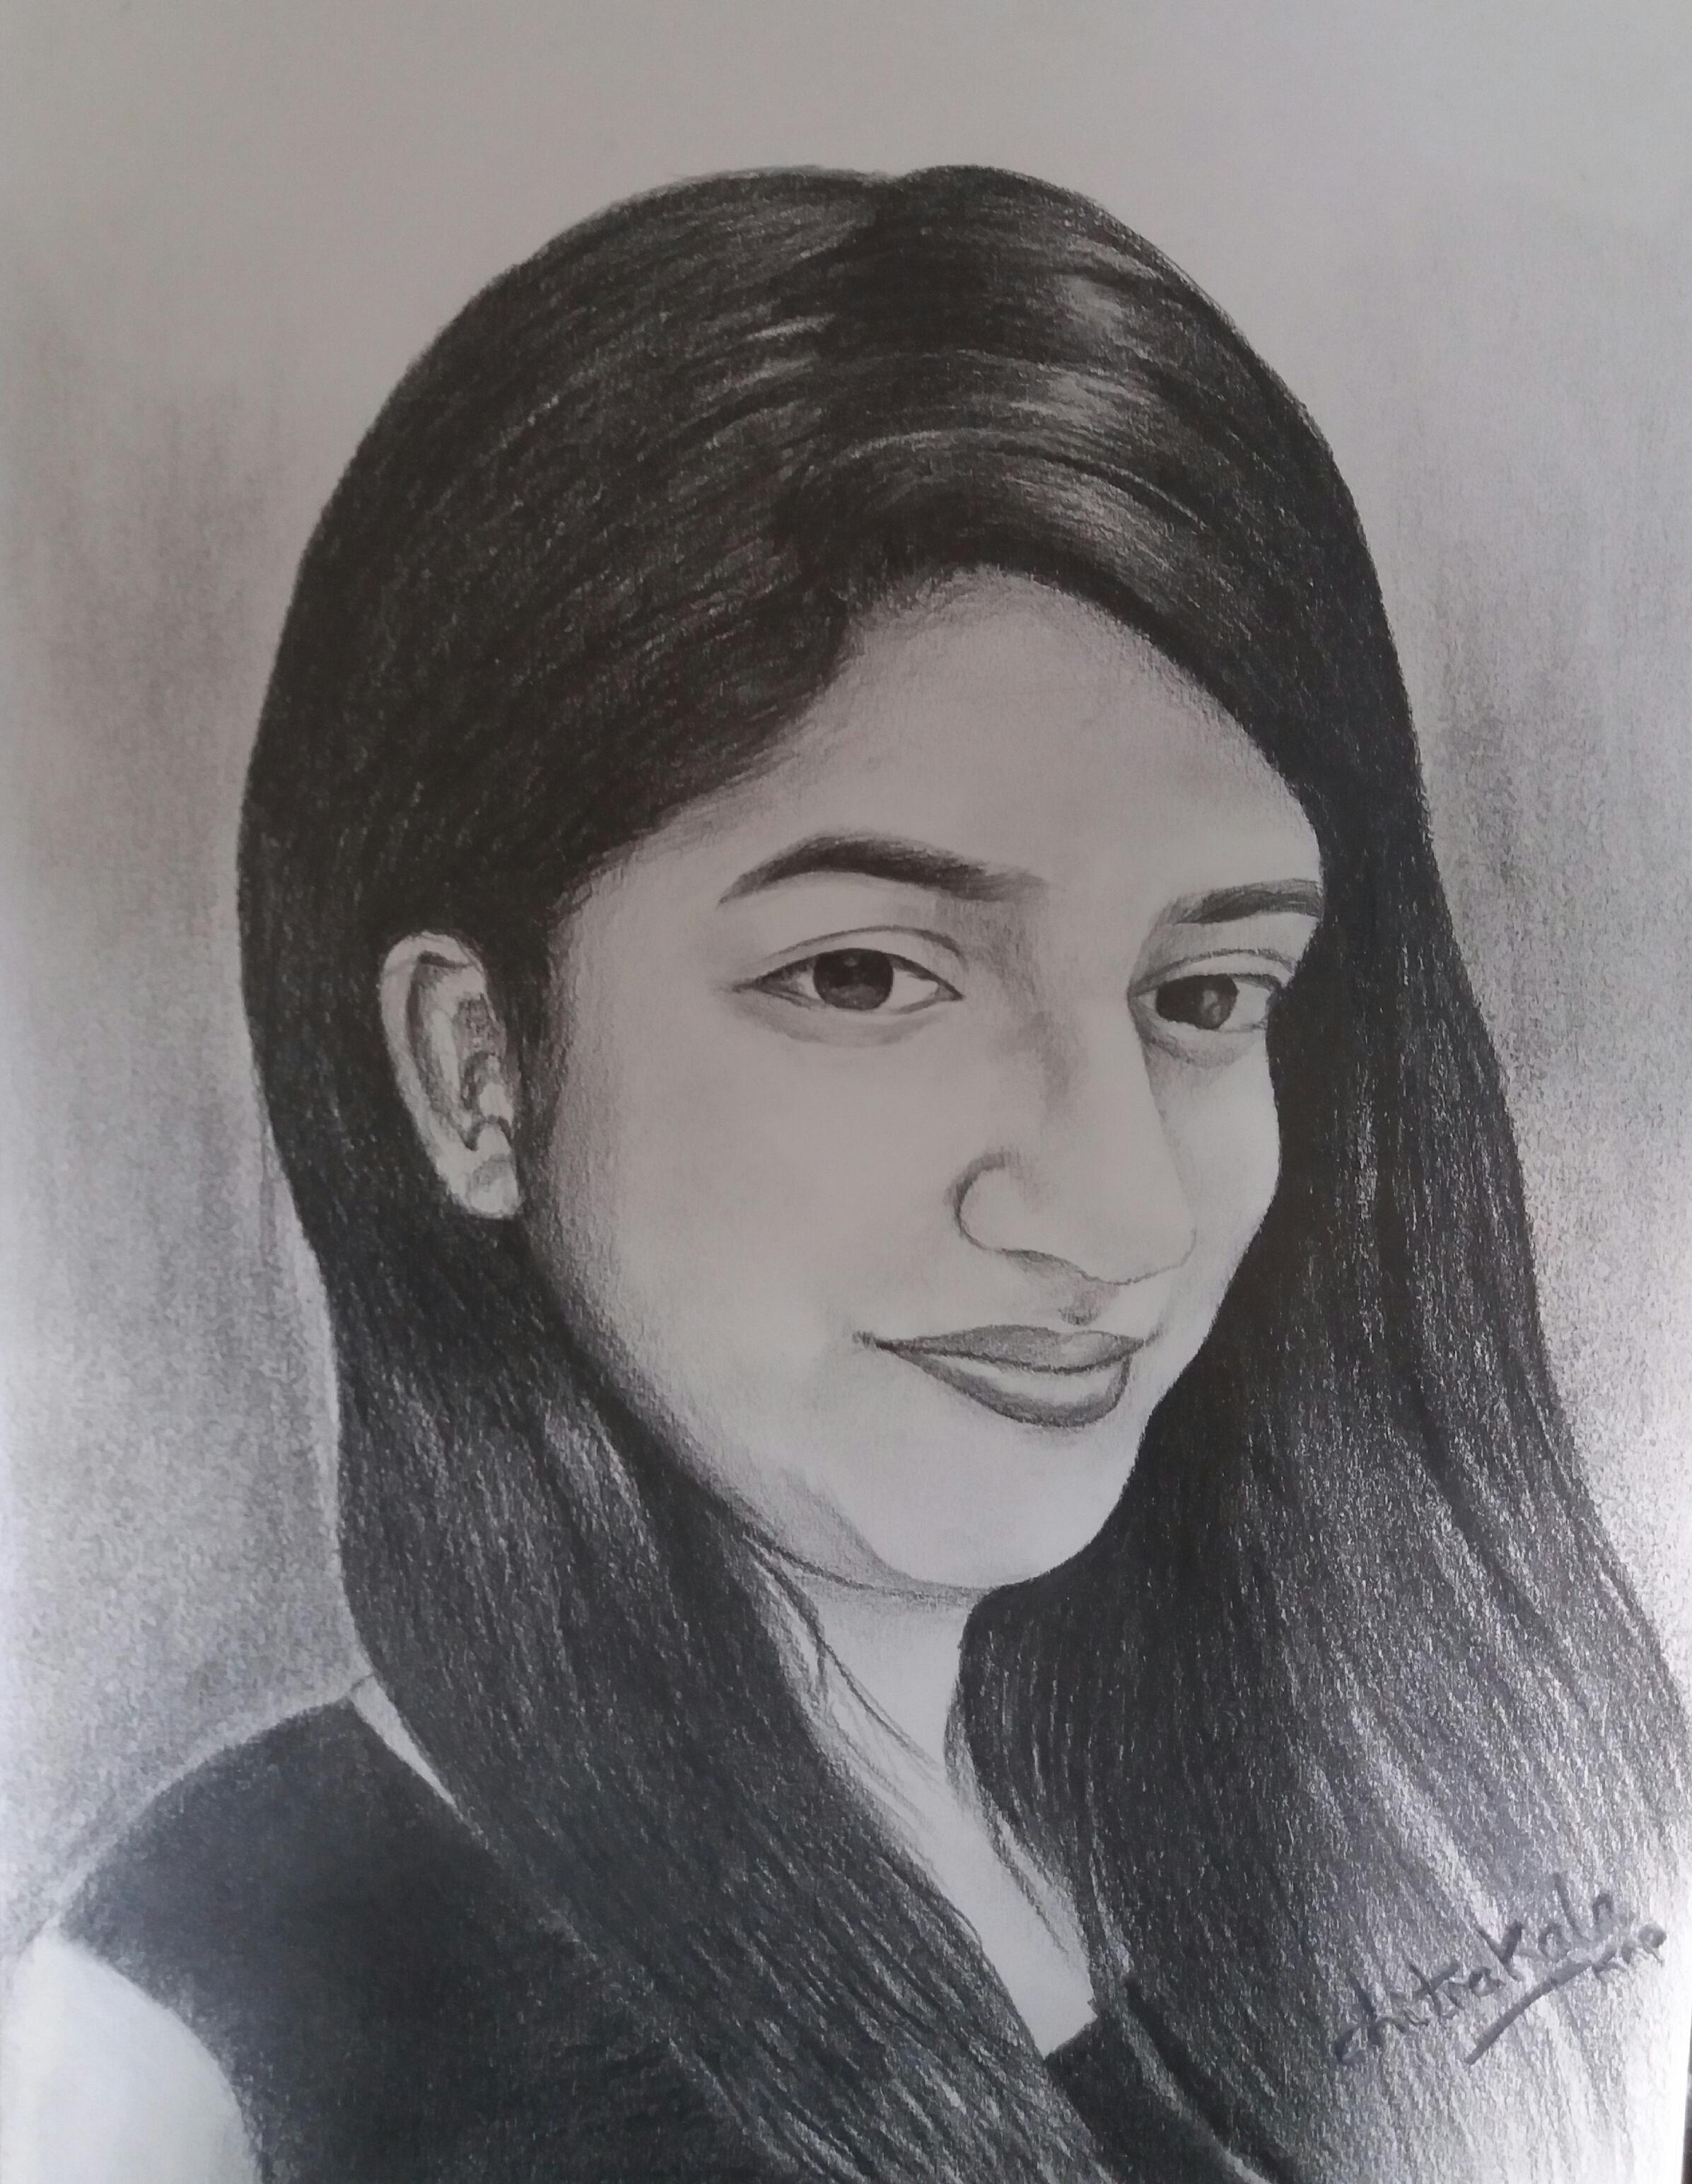 Sketch of a Teen Girl